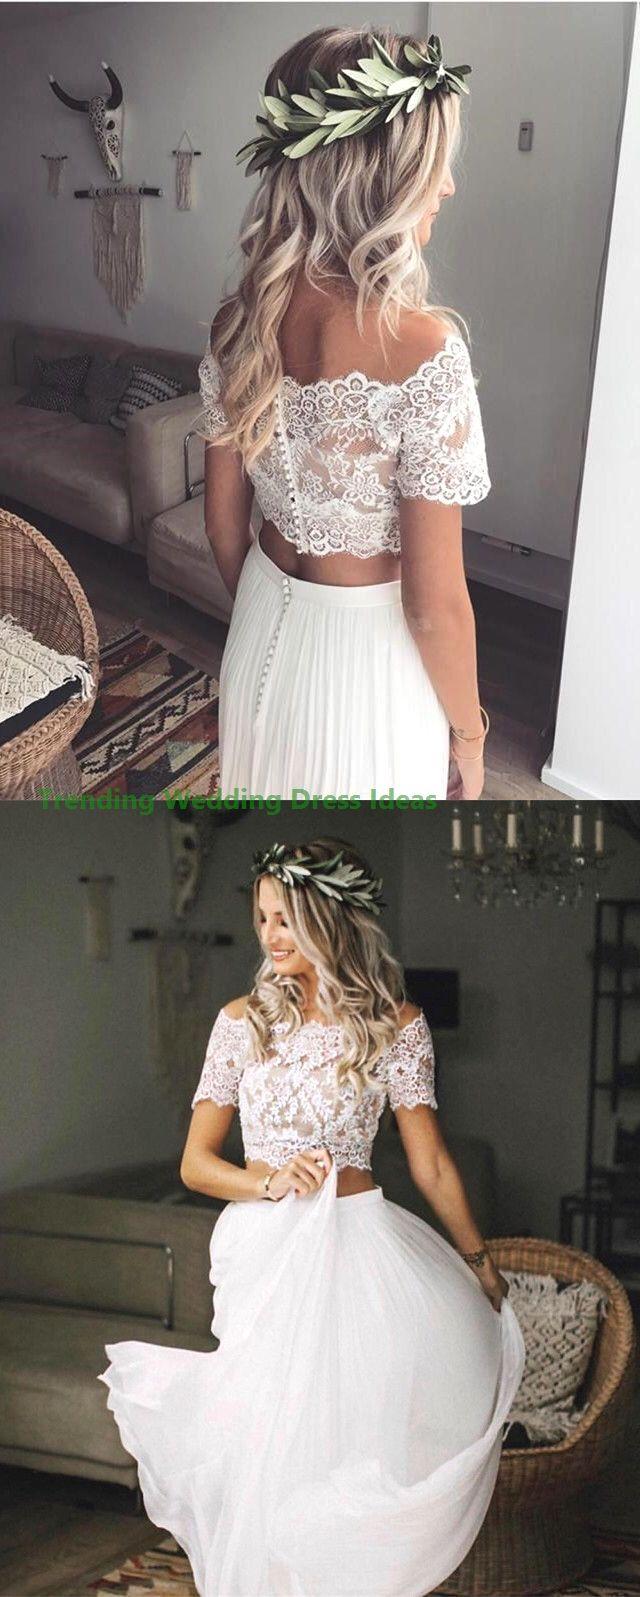 alinanovaBeach Wedding Dresses 2019 Two Piece Wedding Gowns…